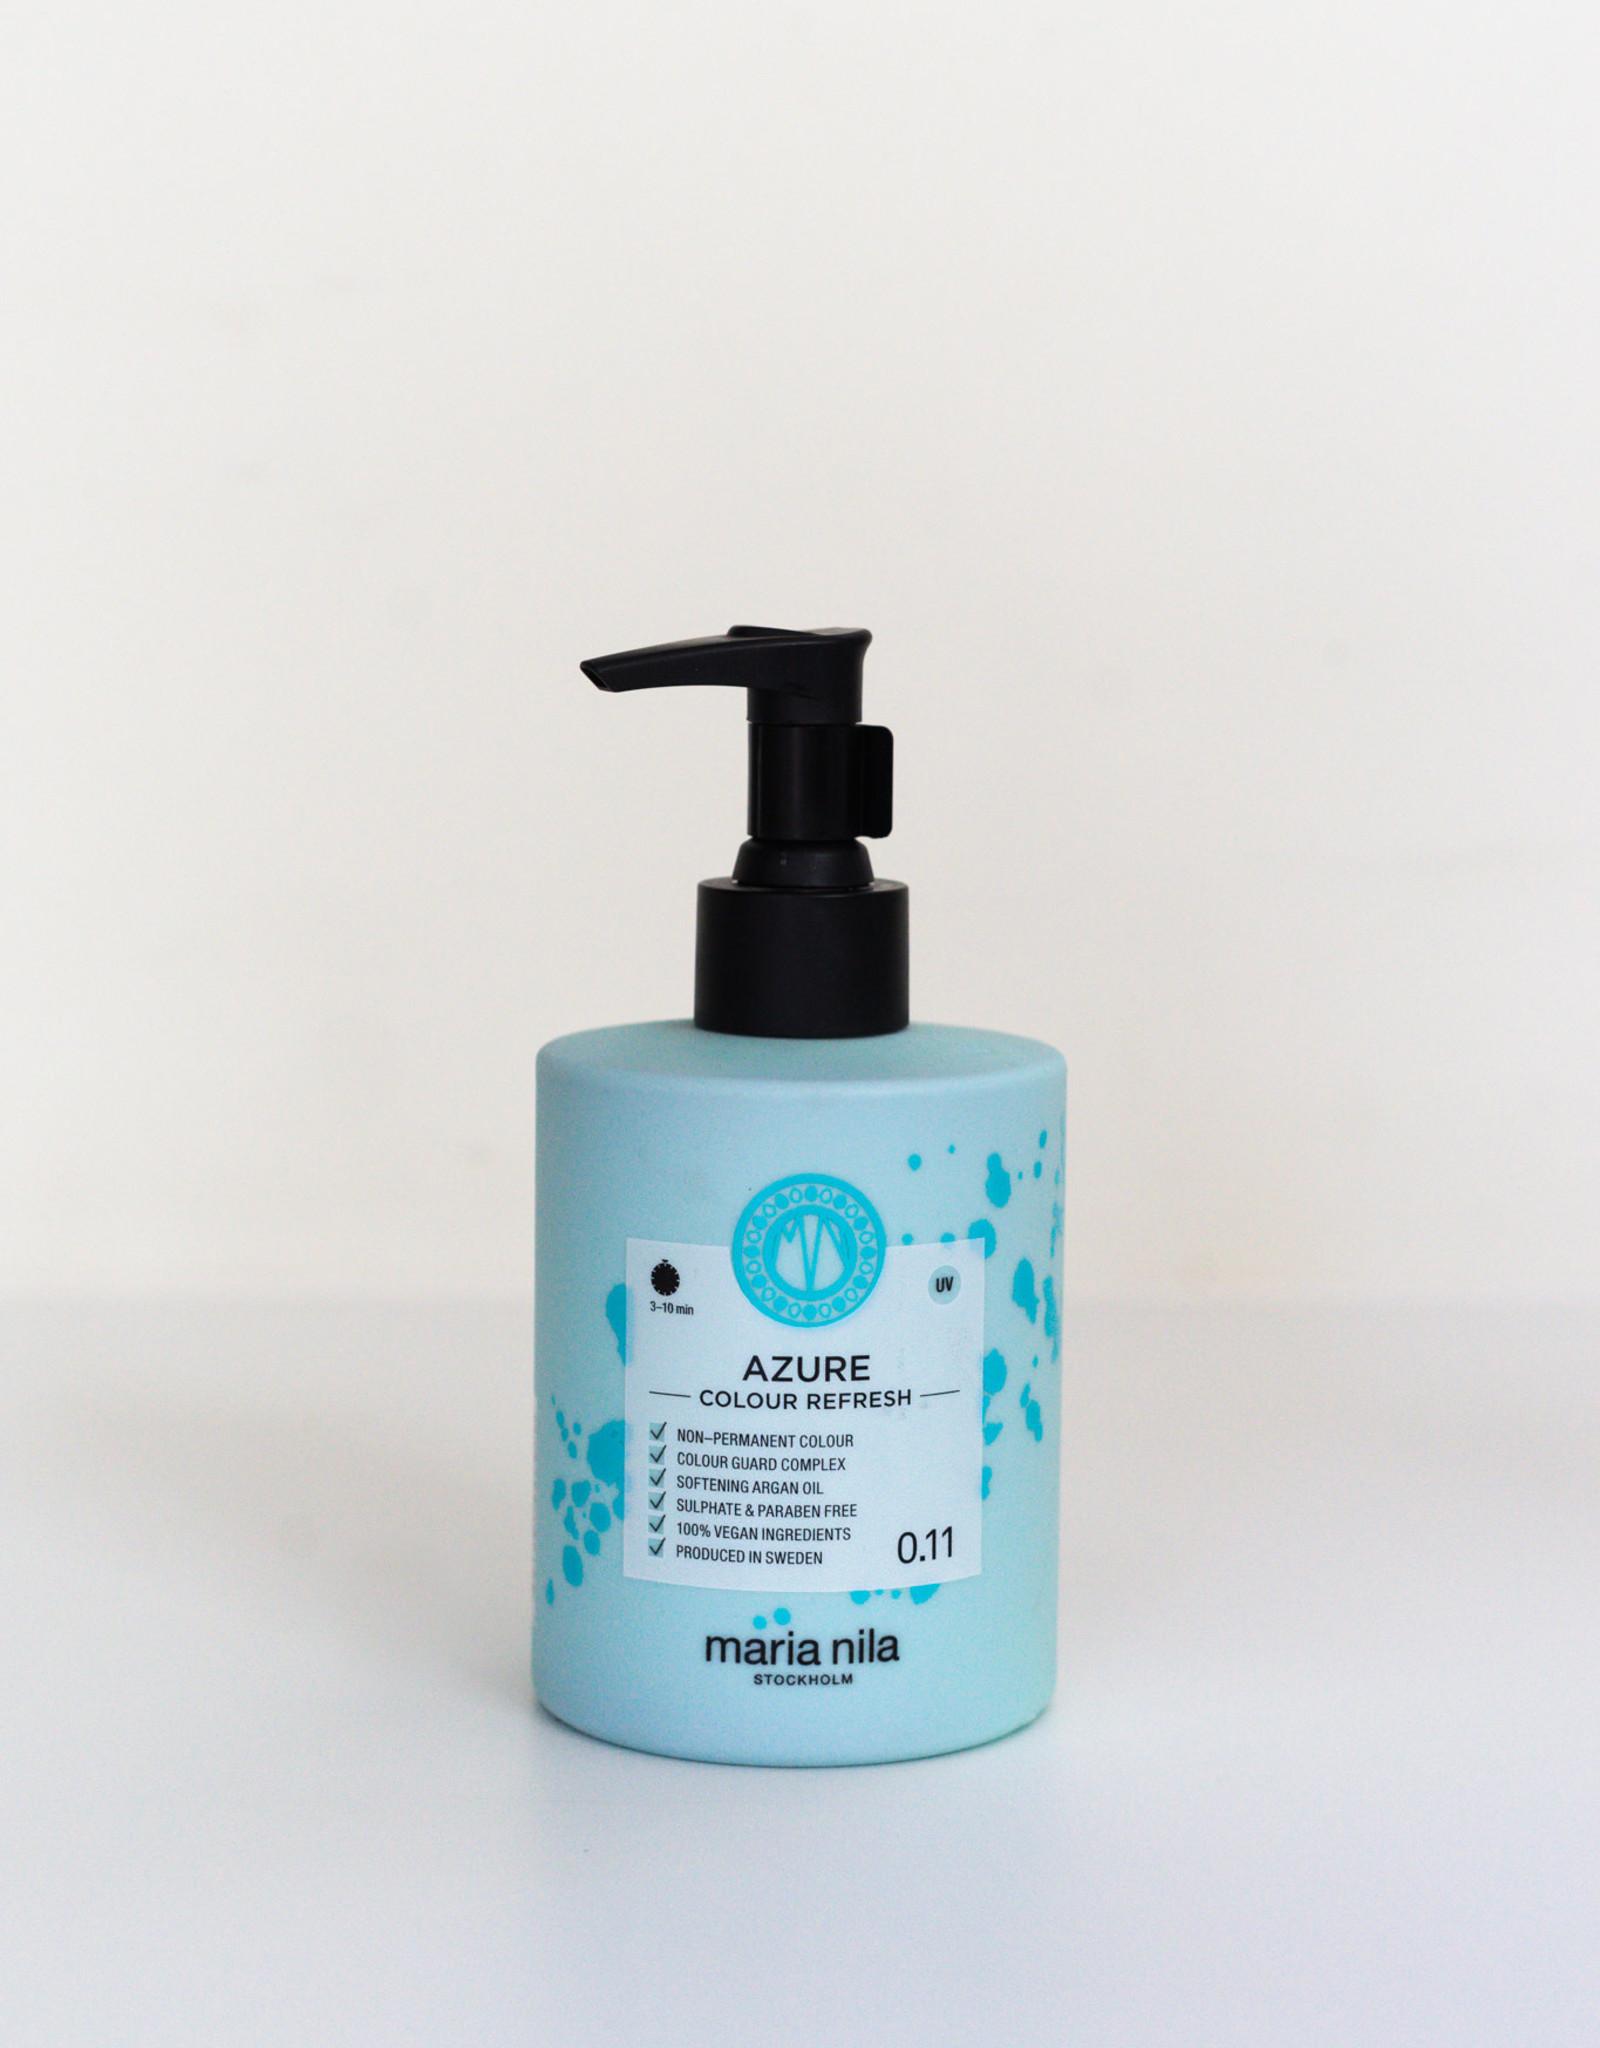 Maria Nila Colour Refresh Azure 300ml